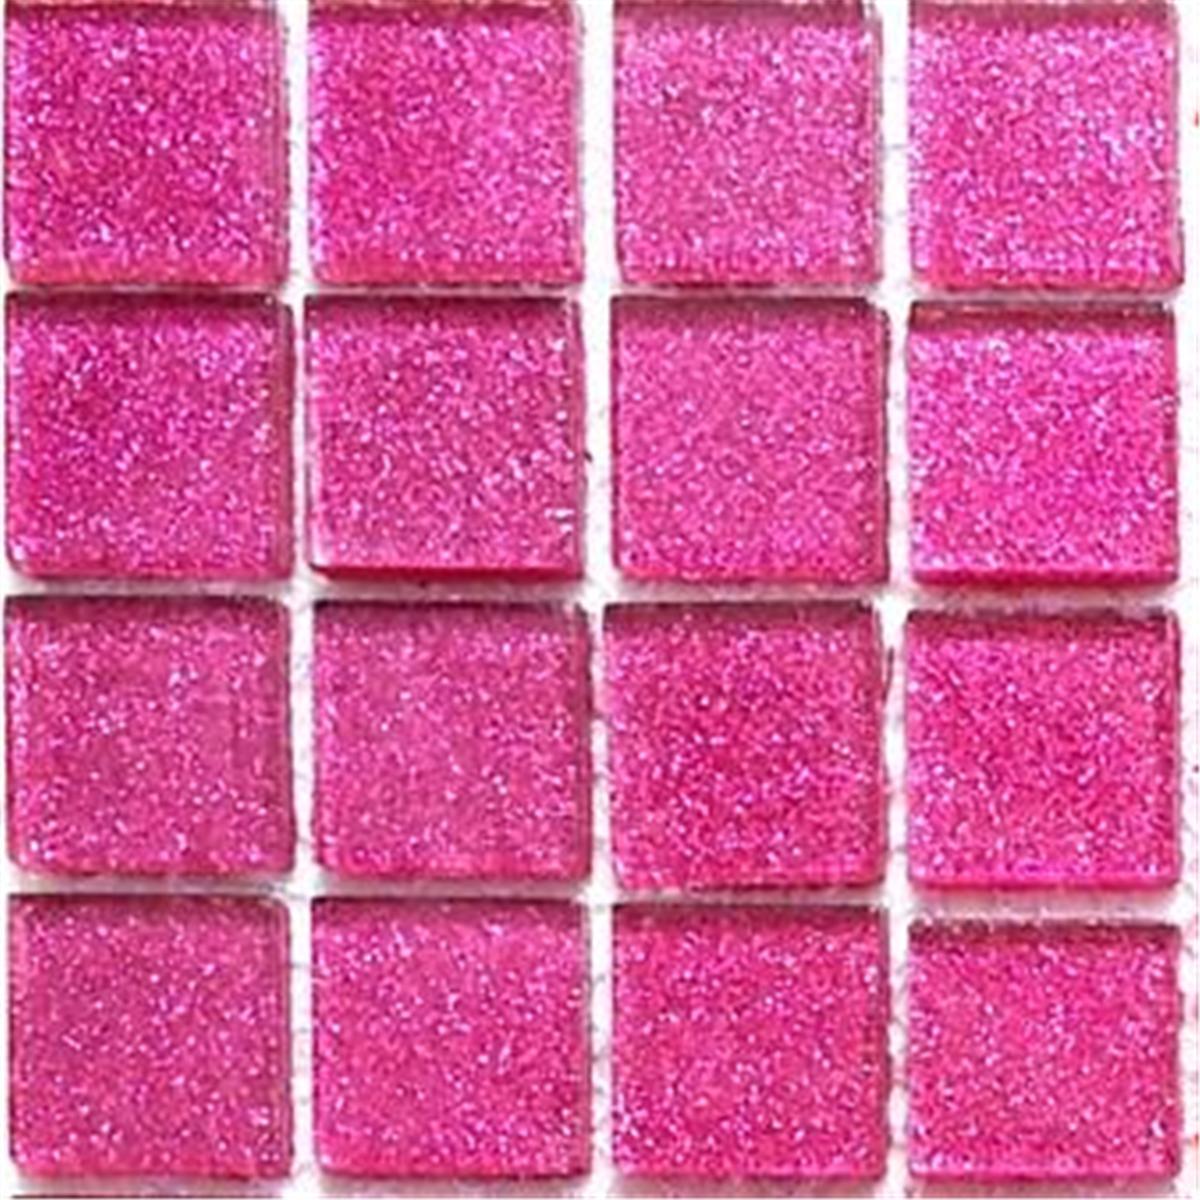 mosaic tiles glass glitter pink bathroom kitchen walls